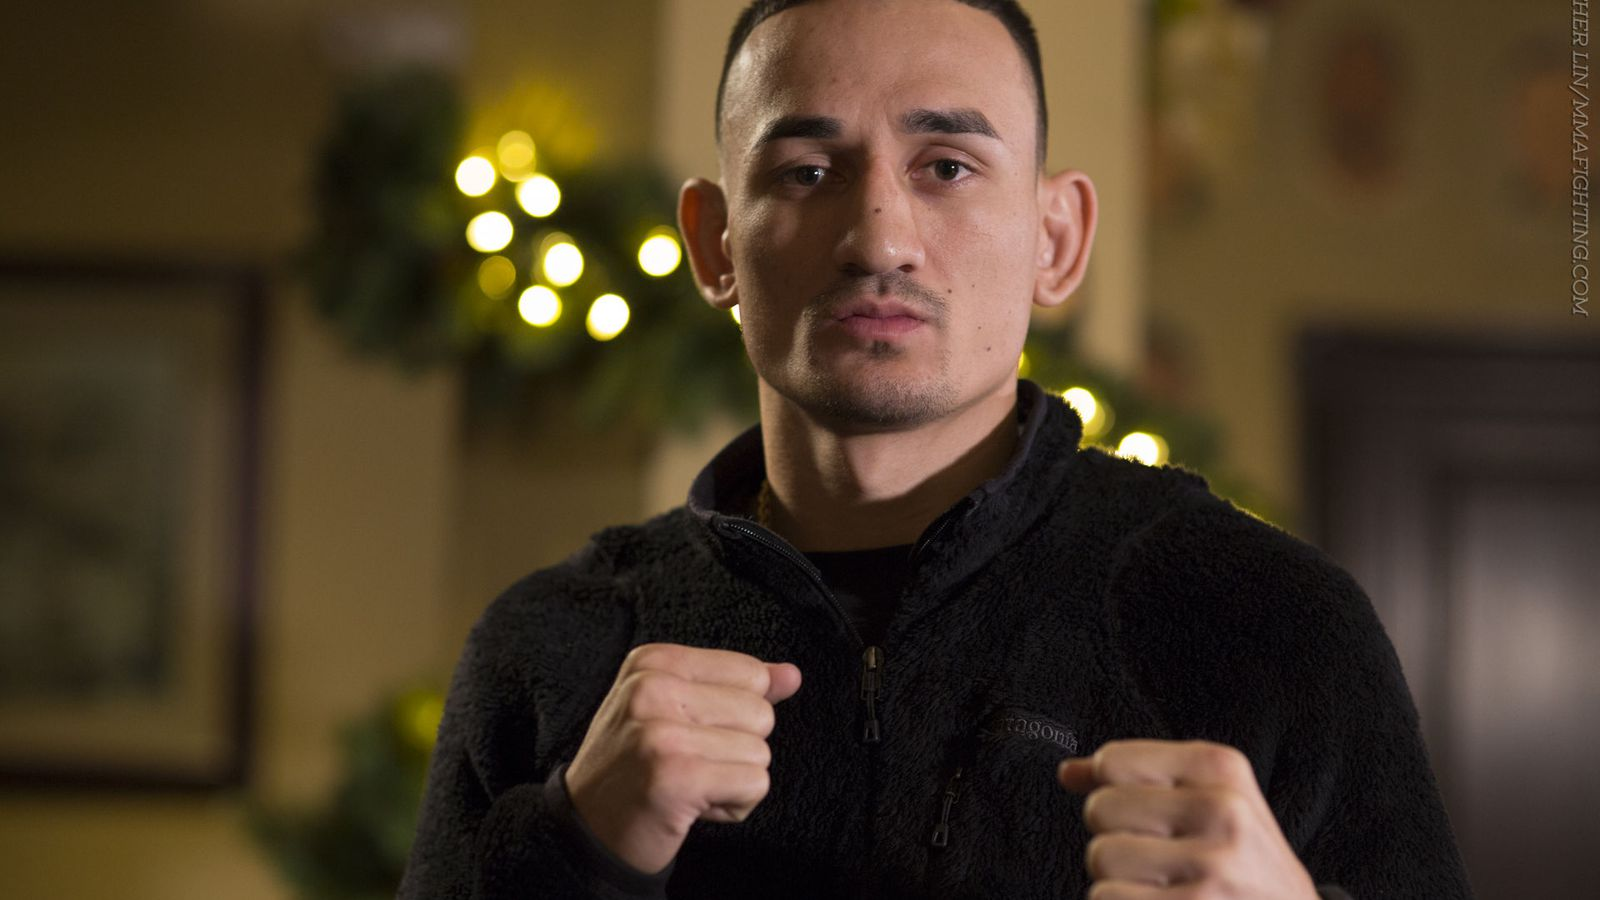 Max Holloway On Nine Fight Win Streak I Dont Care